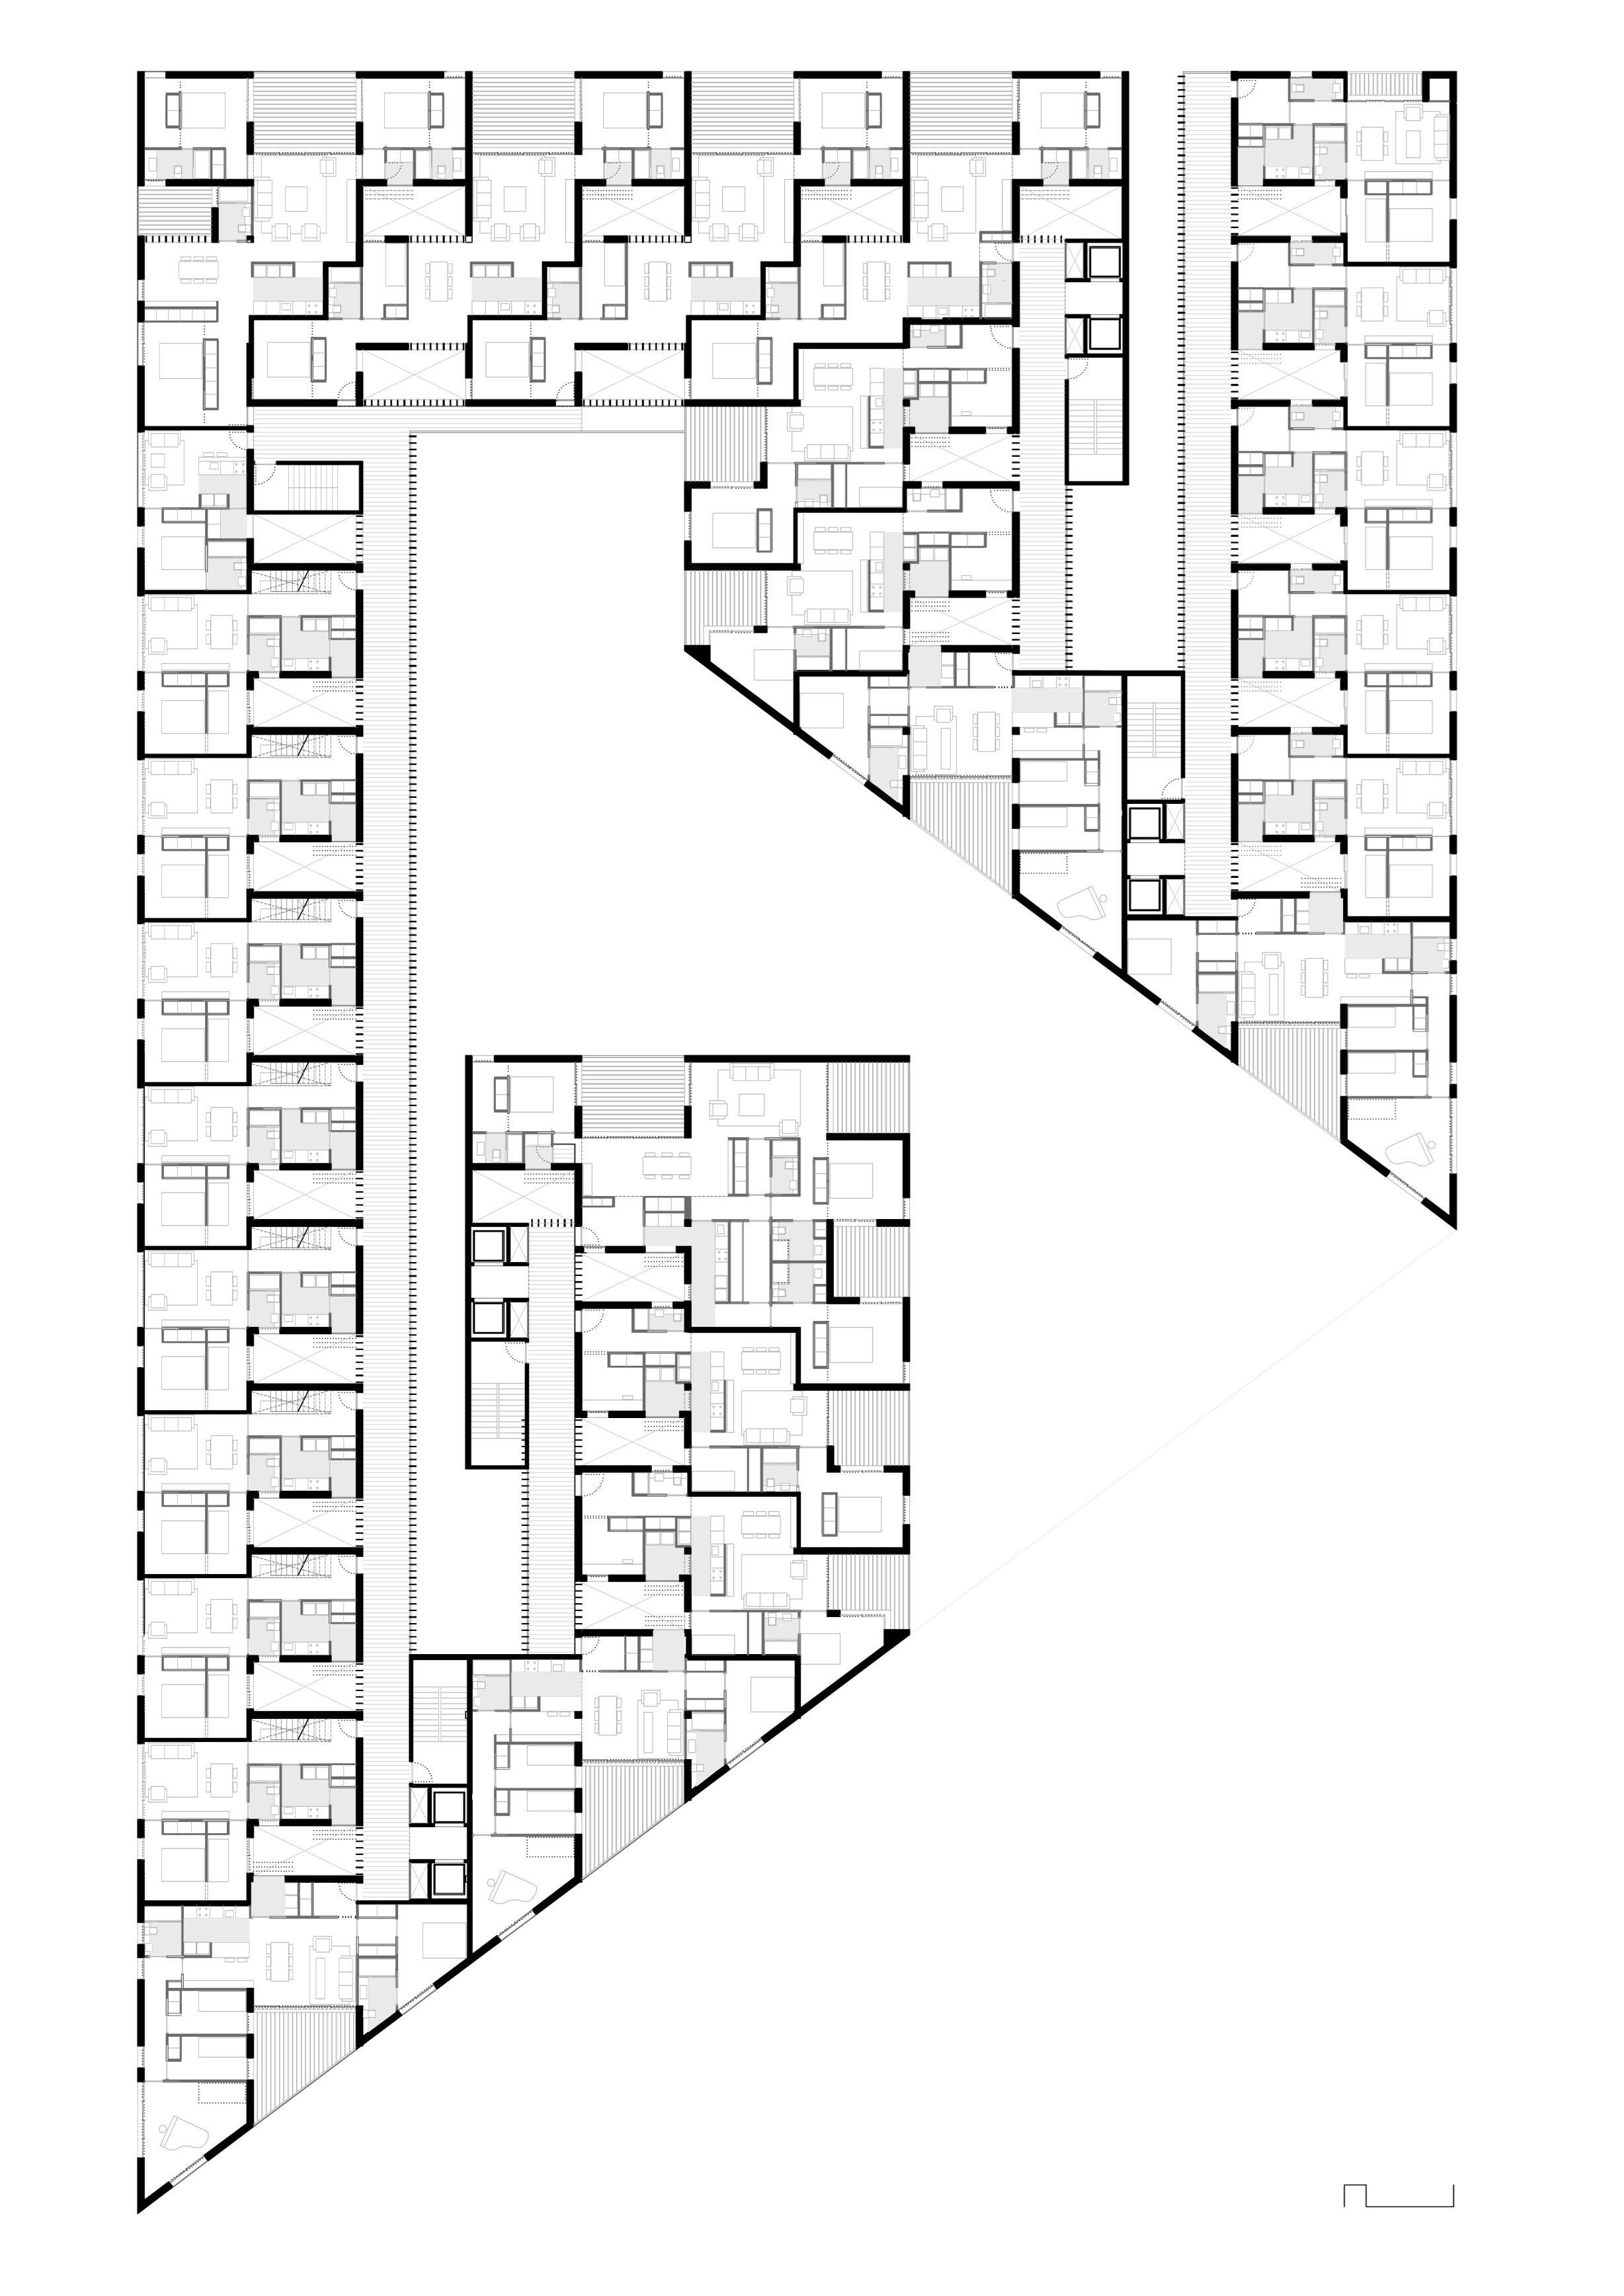 Europan 11 Cerdanyola Josep Ferrando Marc Nadal David Recio Hotel Floor Plan Social Housing Architecture Architectural Floor Plans